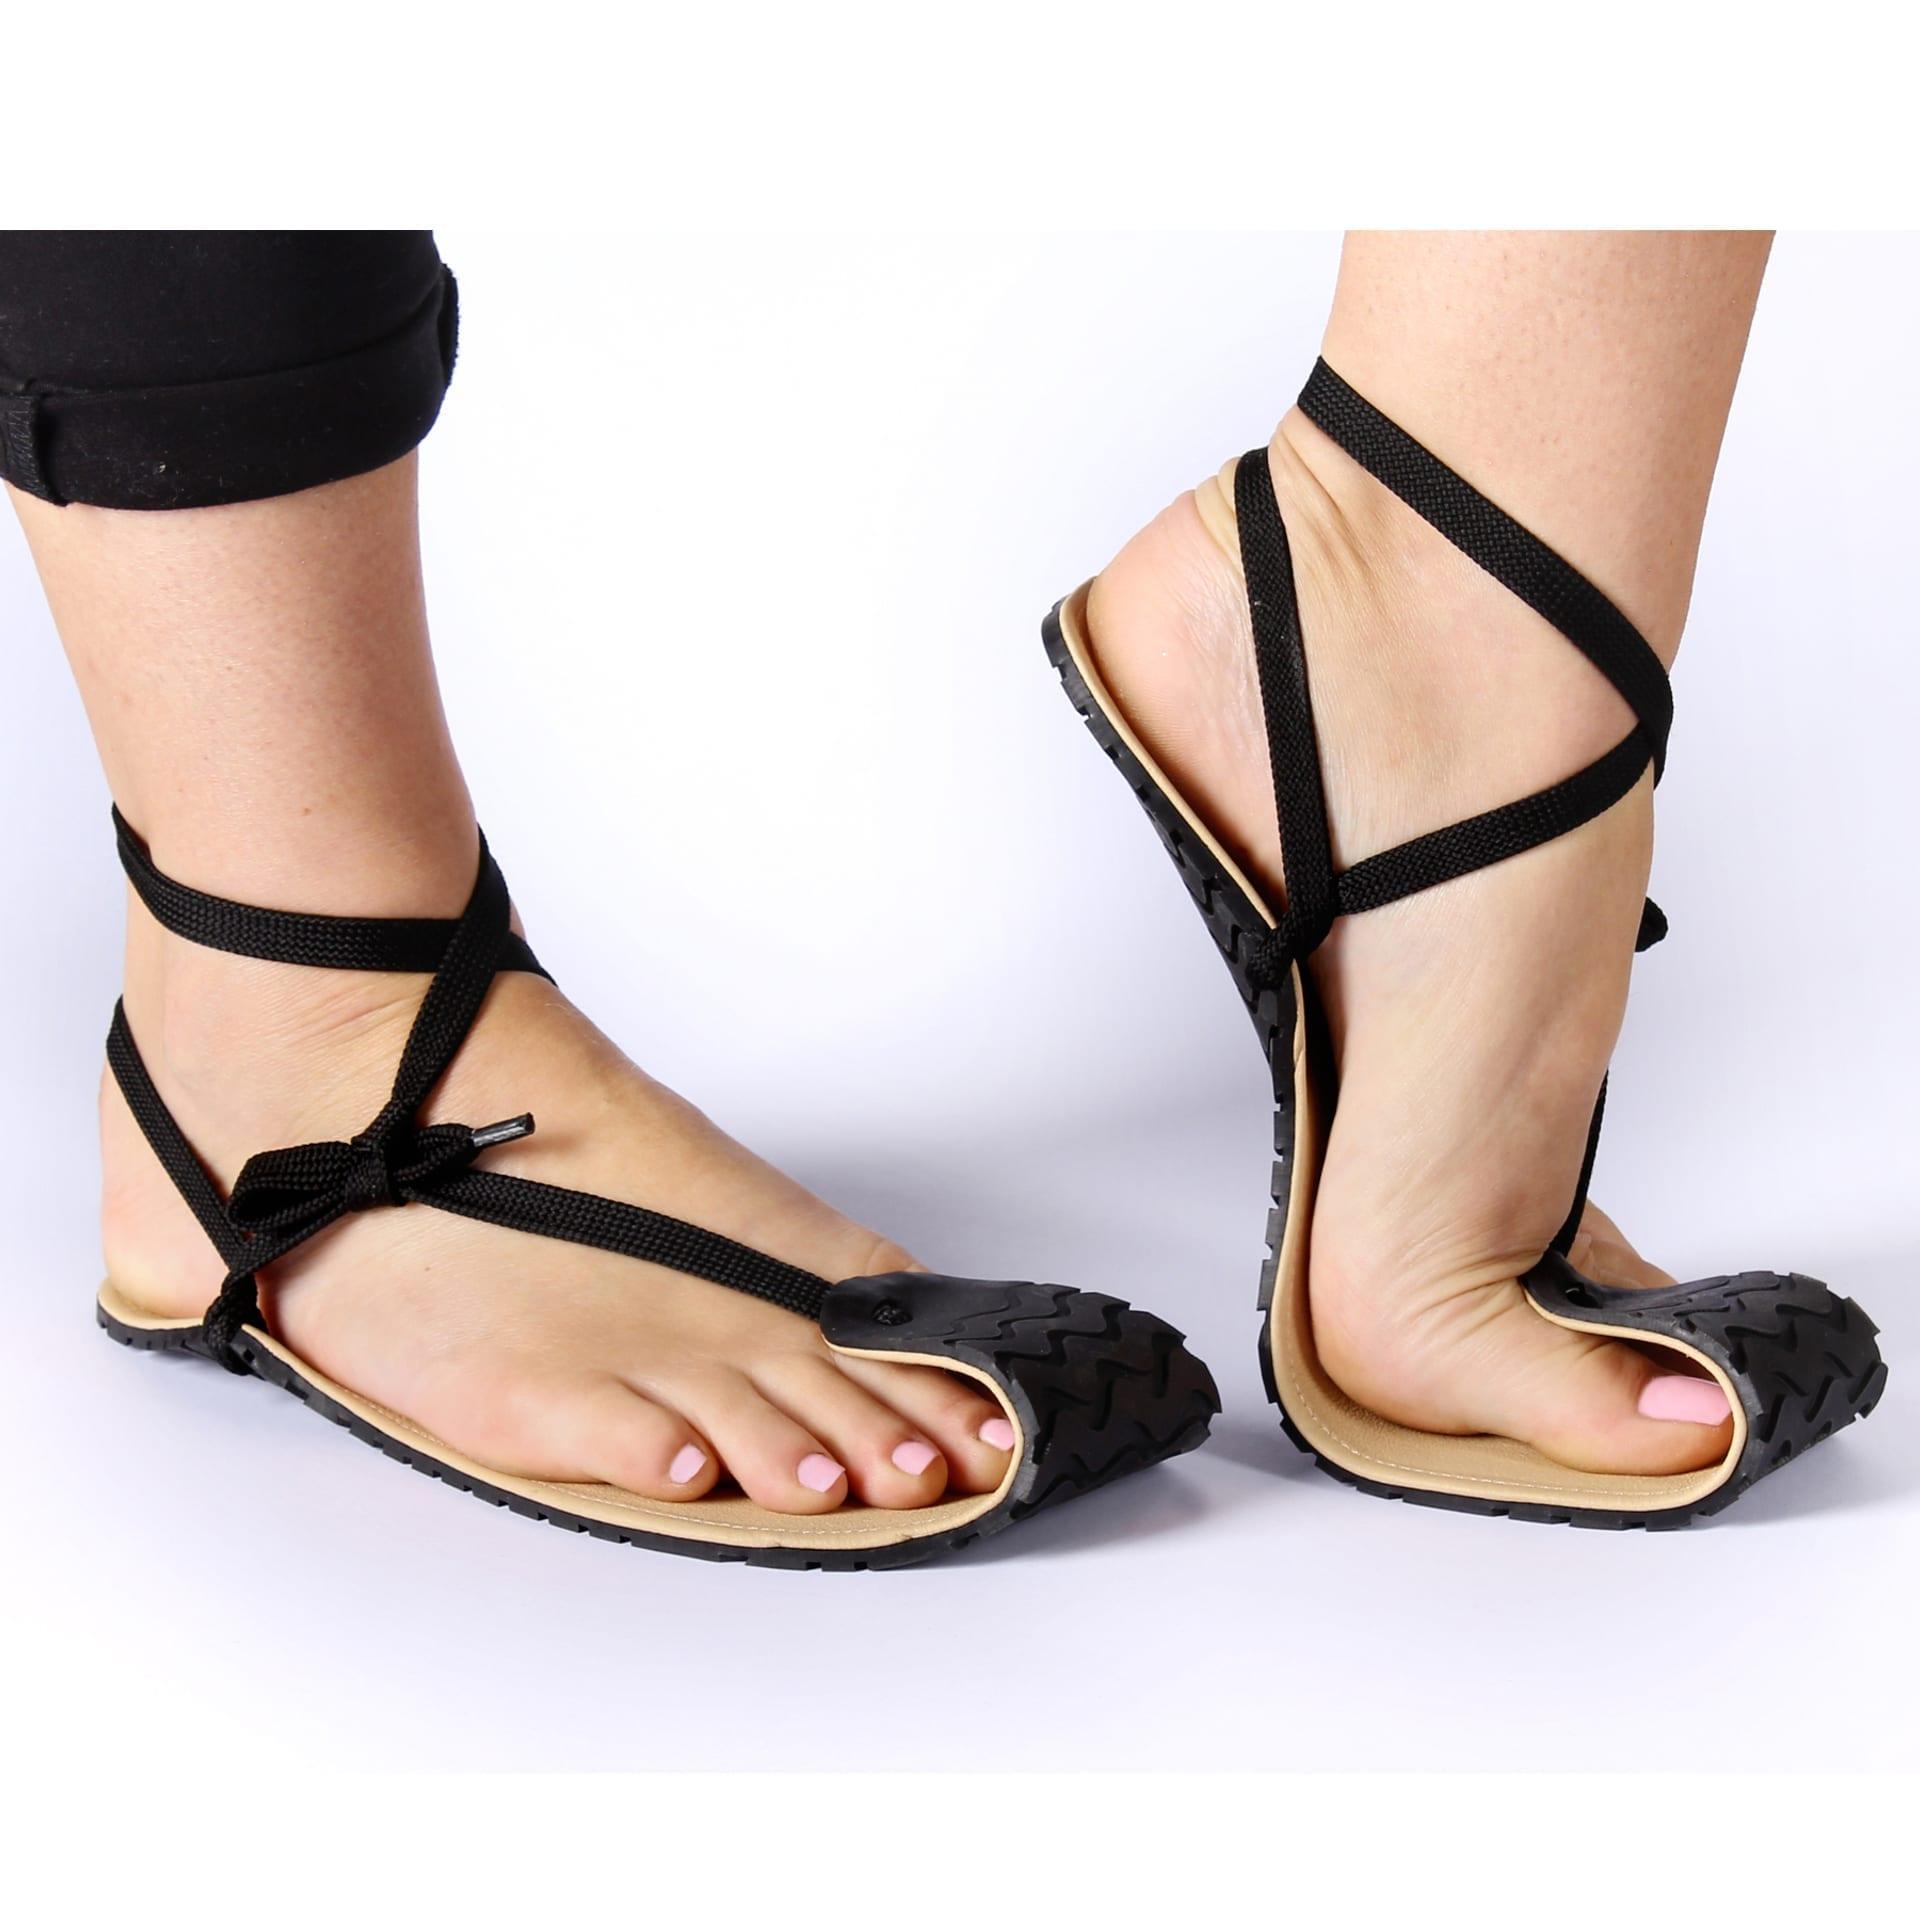 Magical Shoes CABALLO BLANCO- HUARACHE SANDALS picture 1